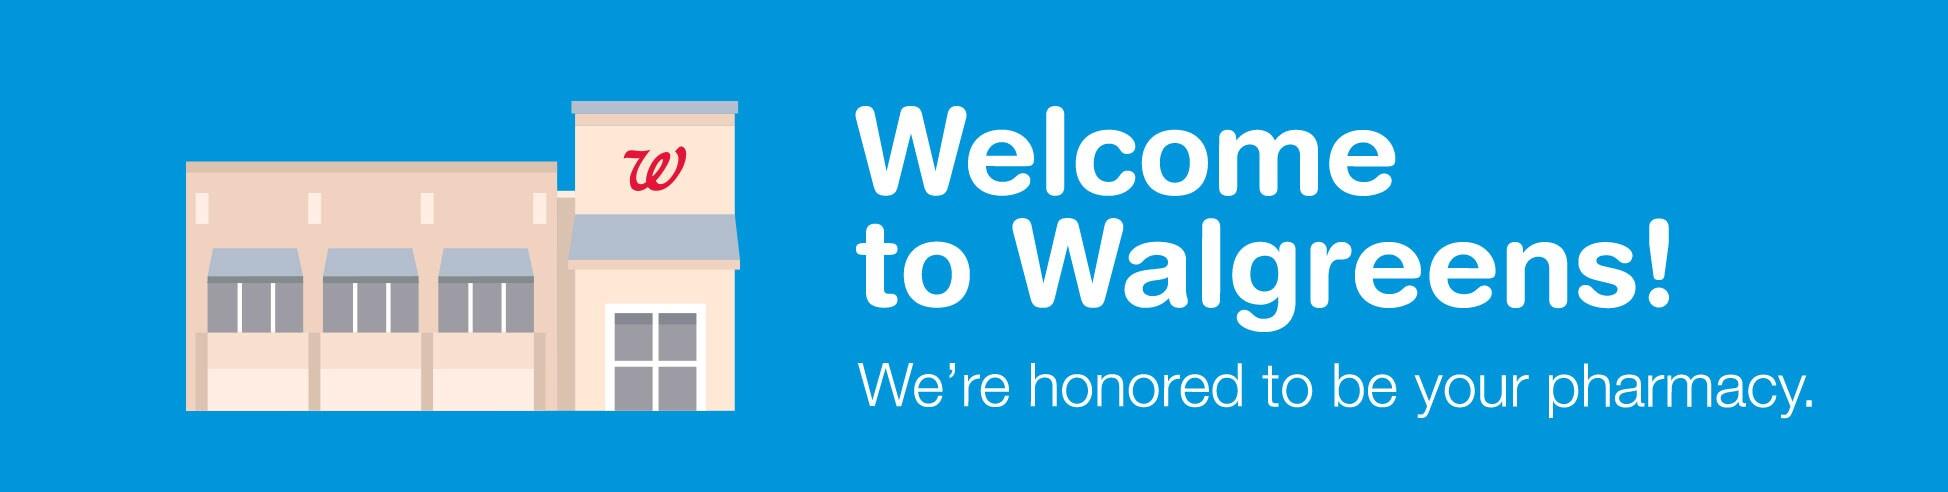 welcome prime therapeutics members walgreens